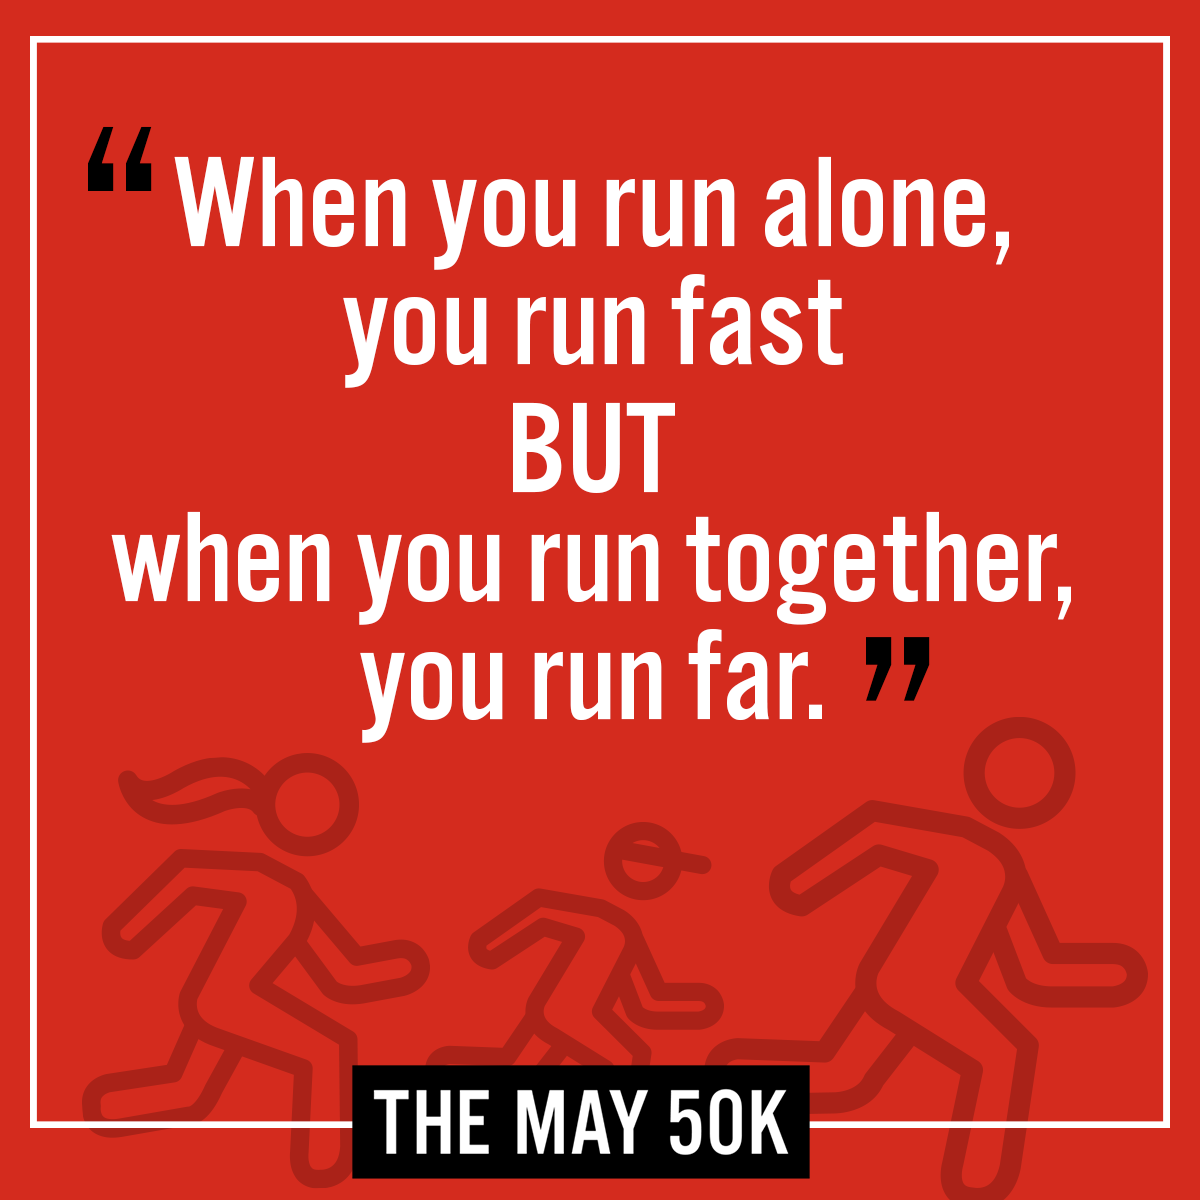 Social Posts - Run Quote - Team